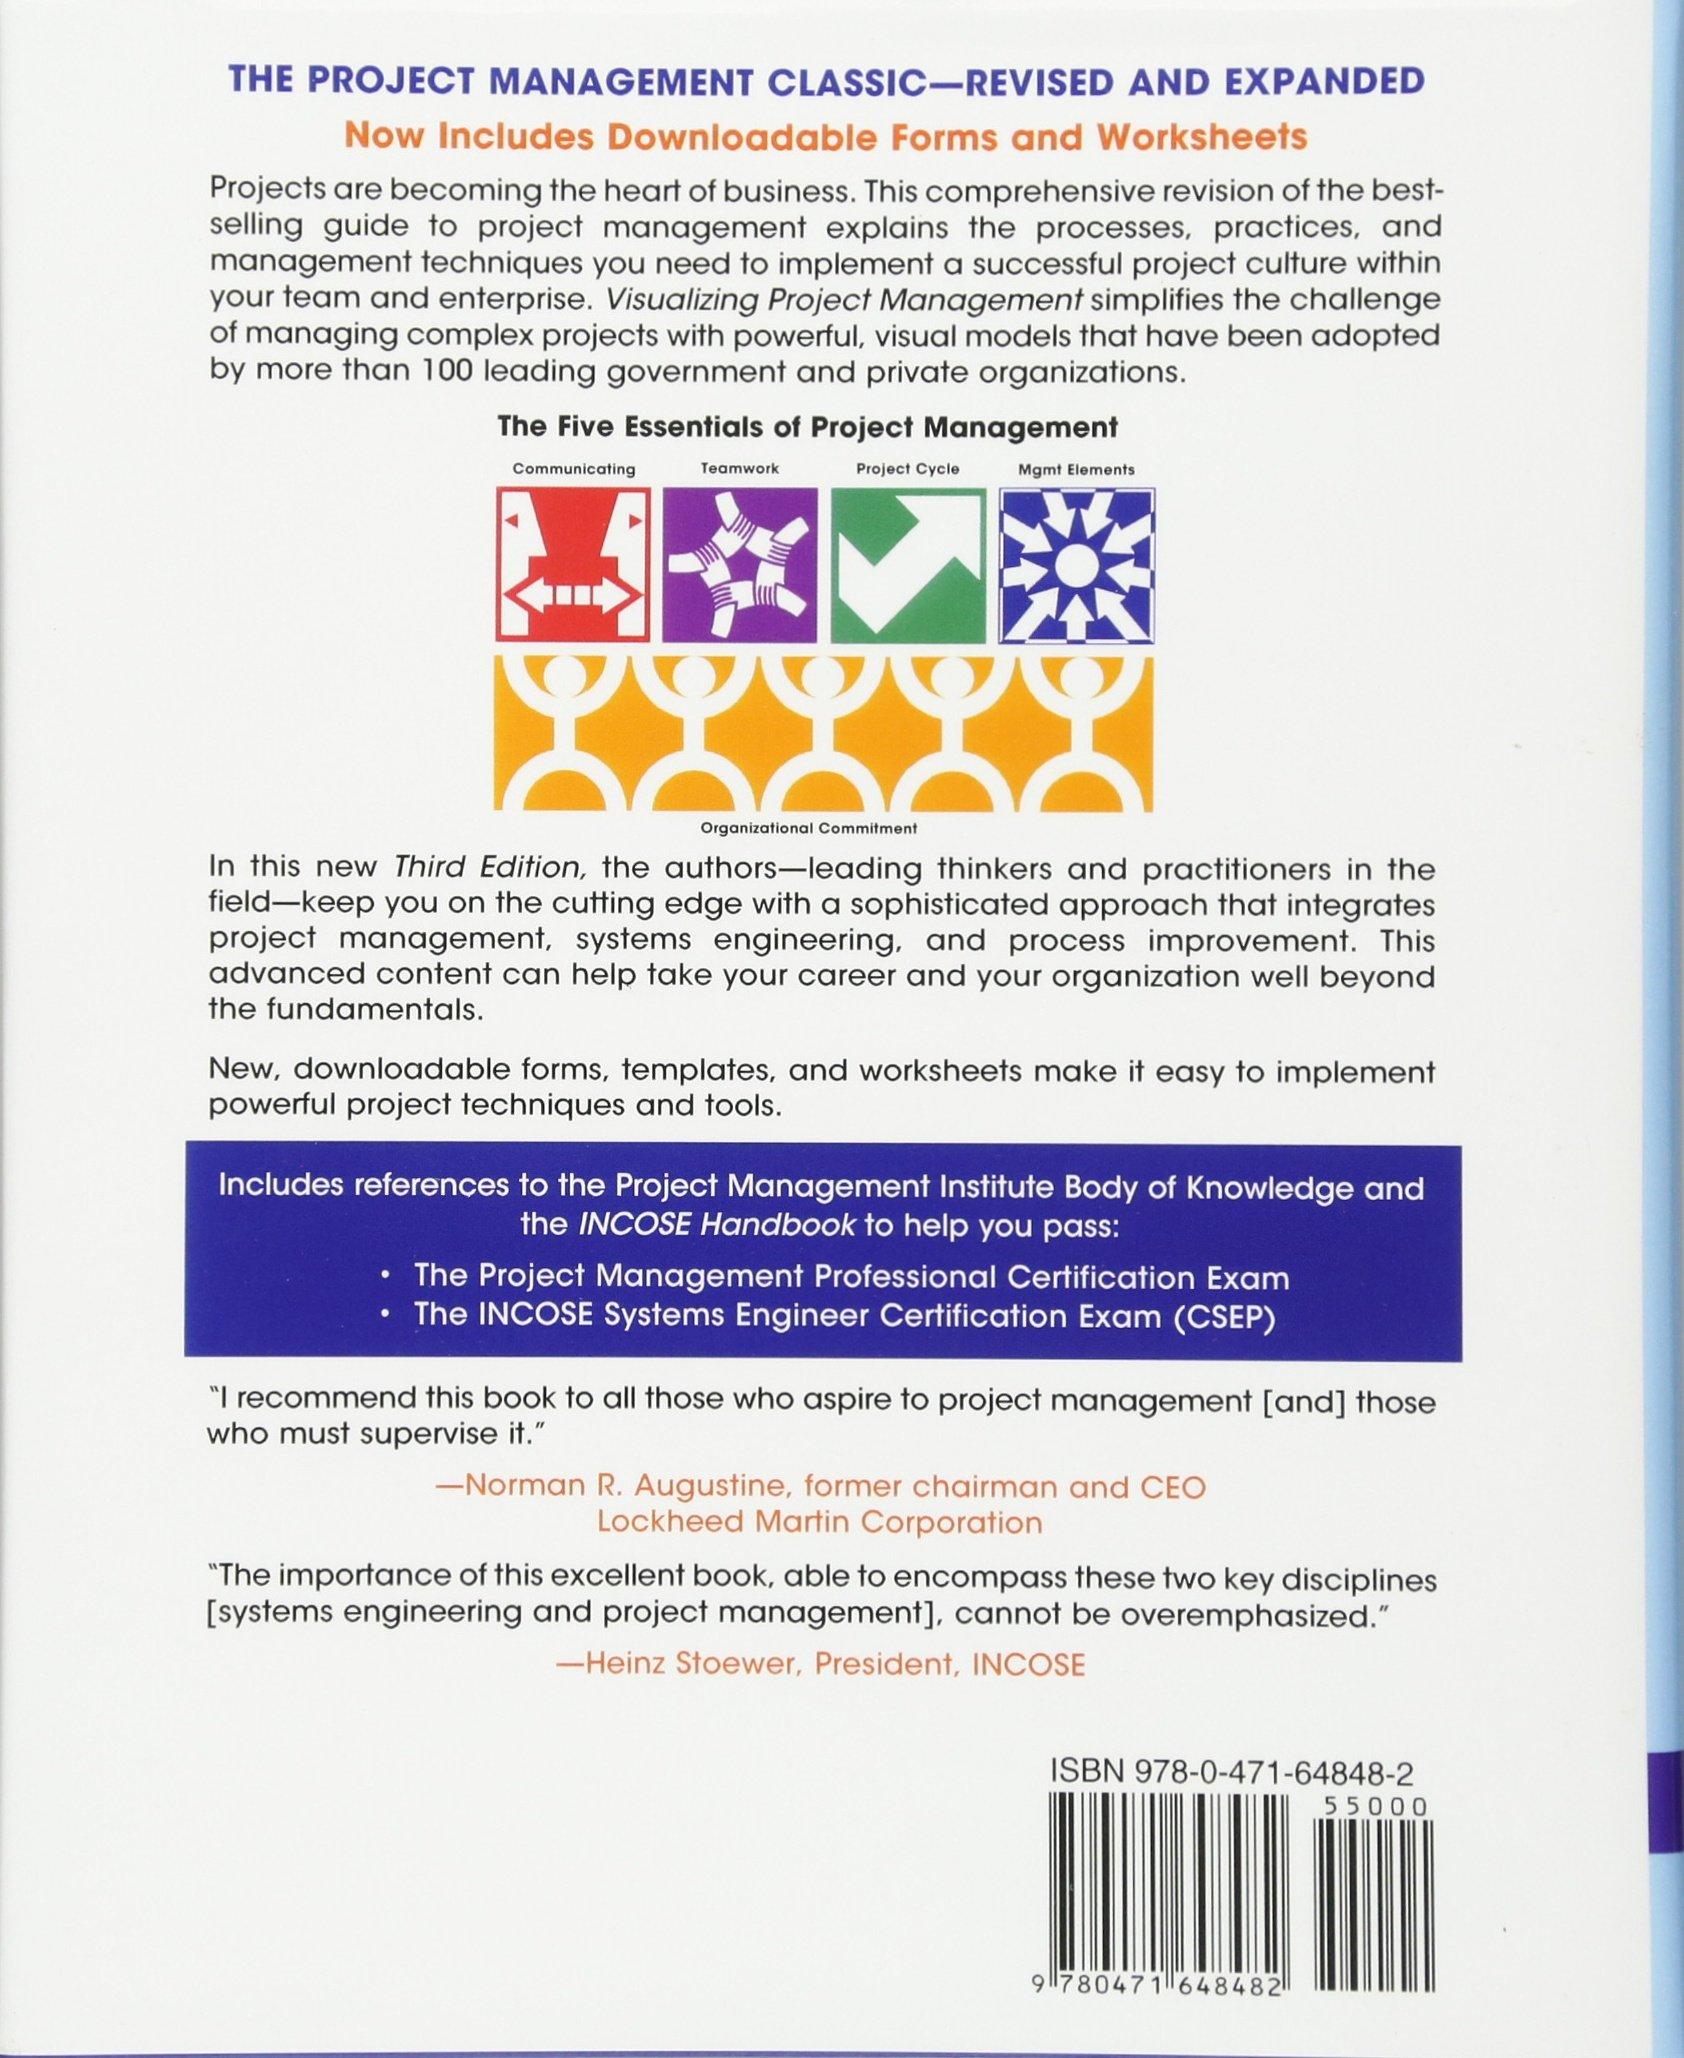 Visualizing Project Management Models And Frameworks For Mastering